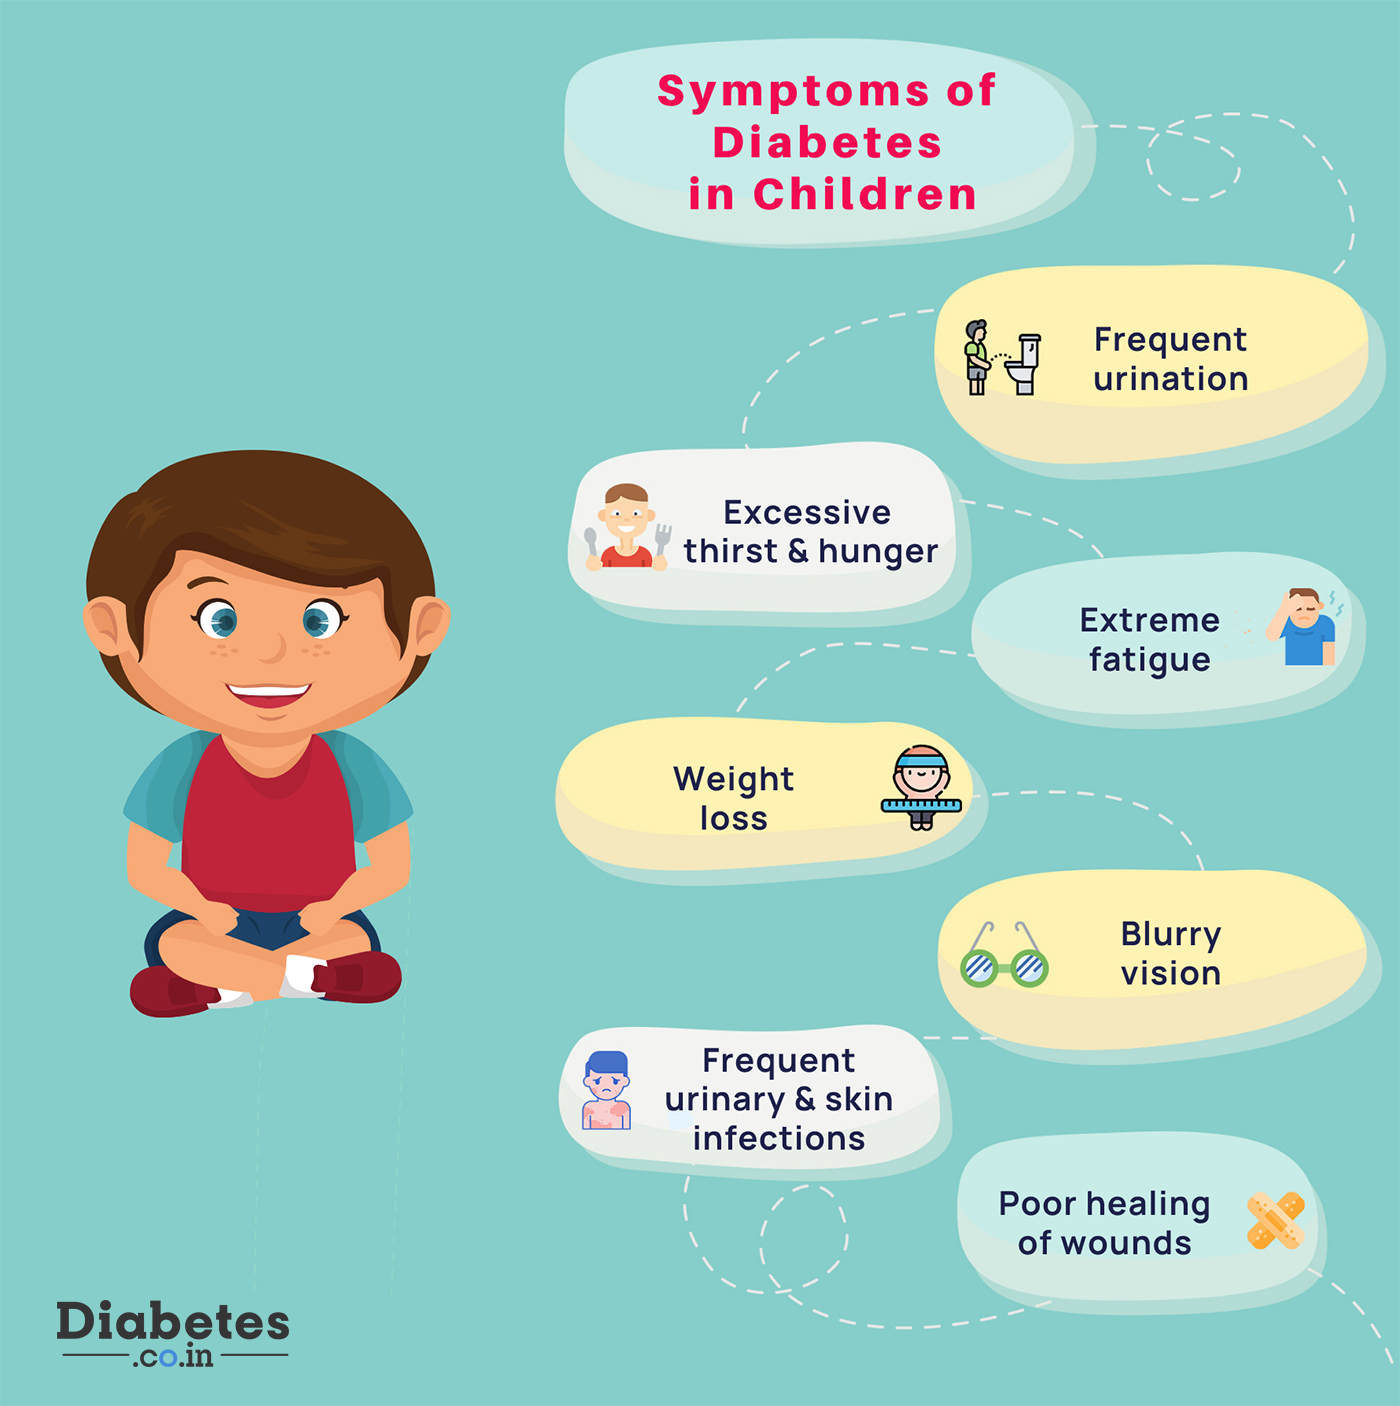 diabetes symptoms in children